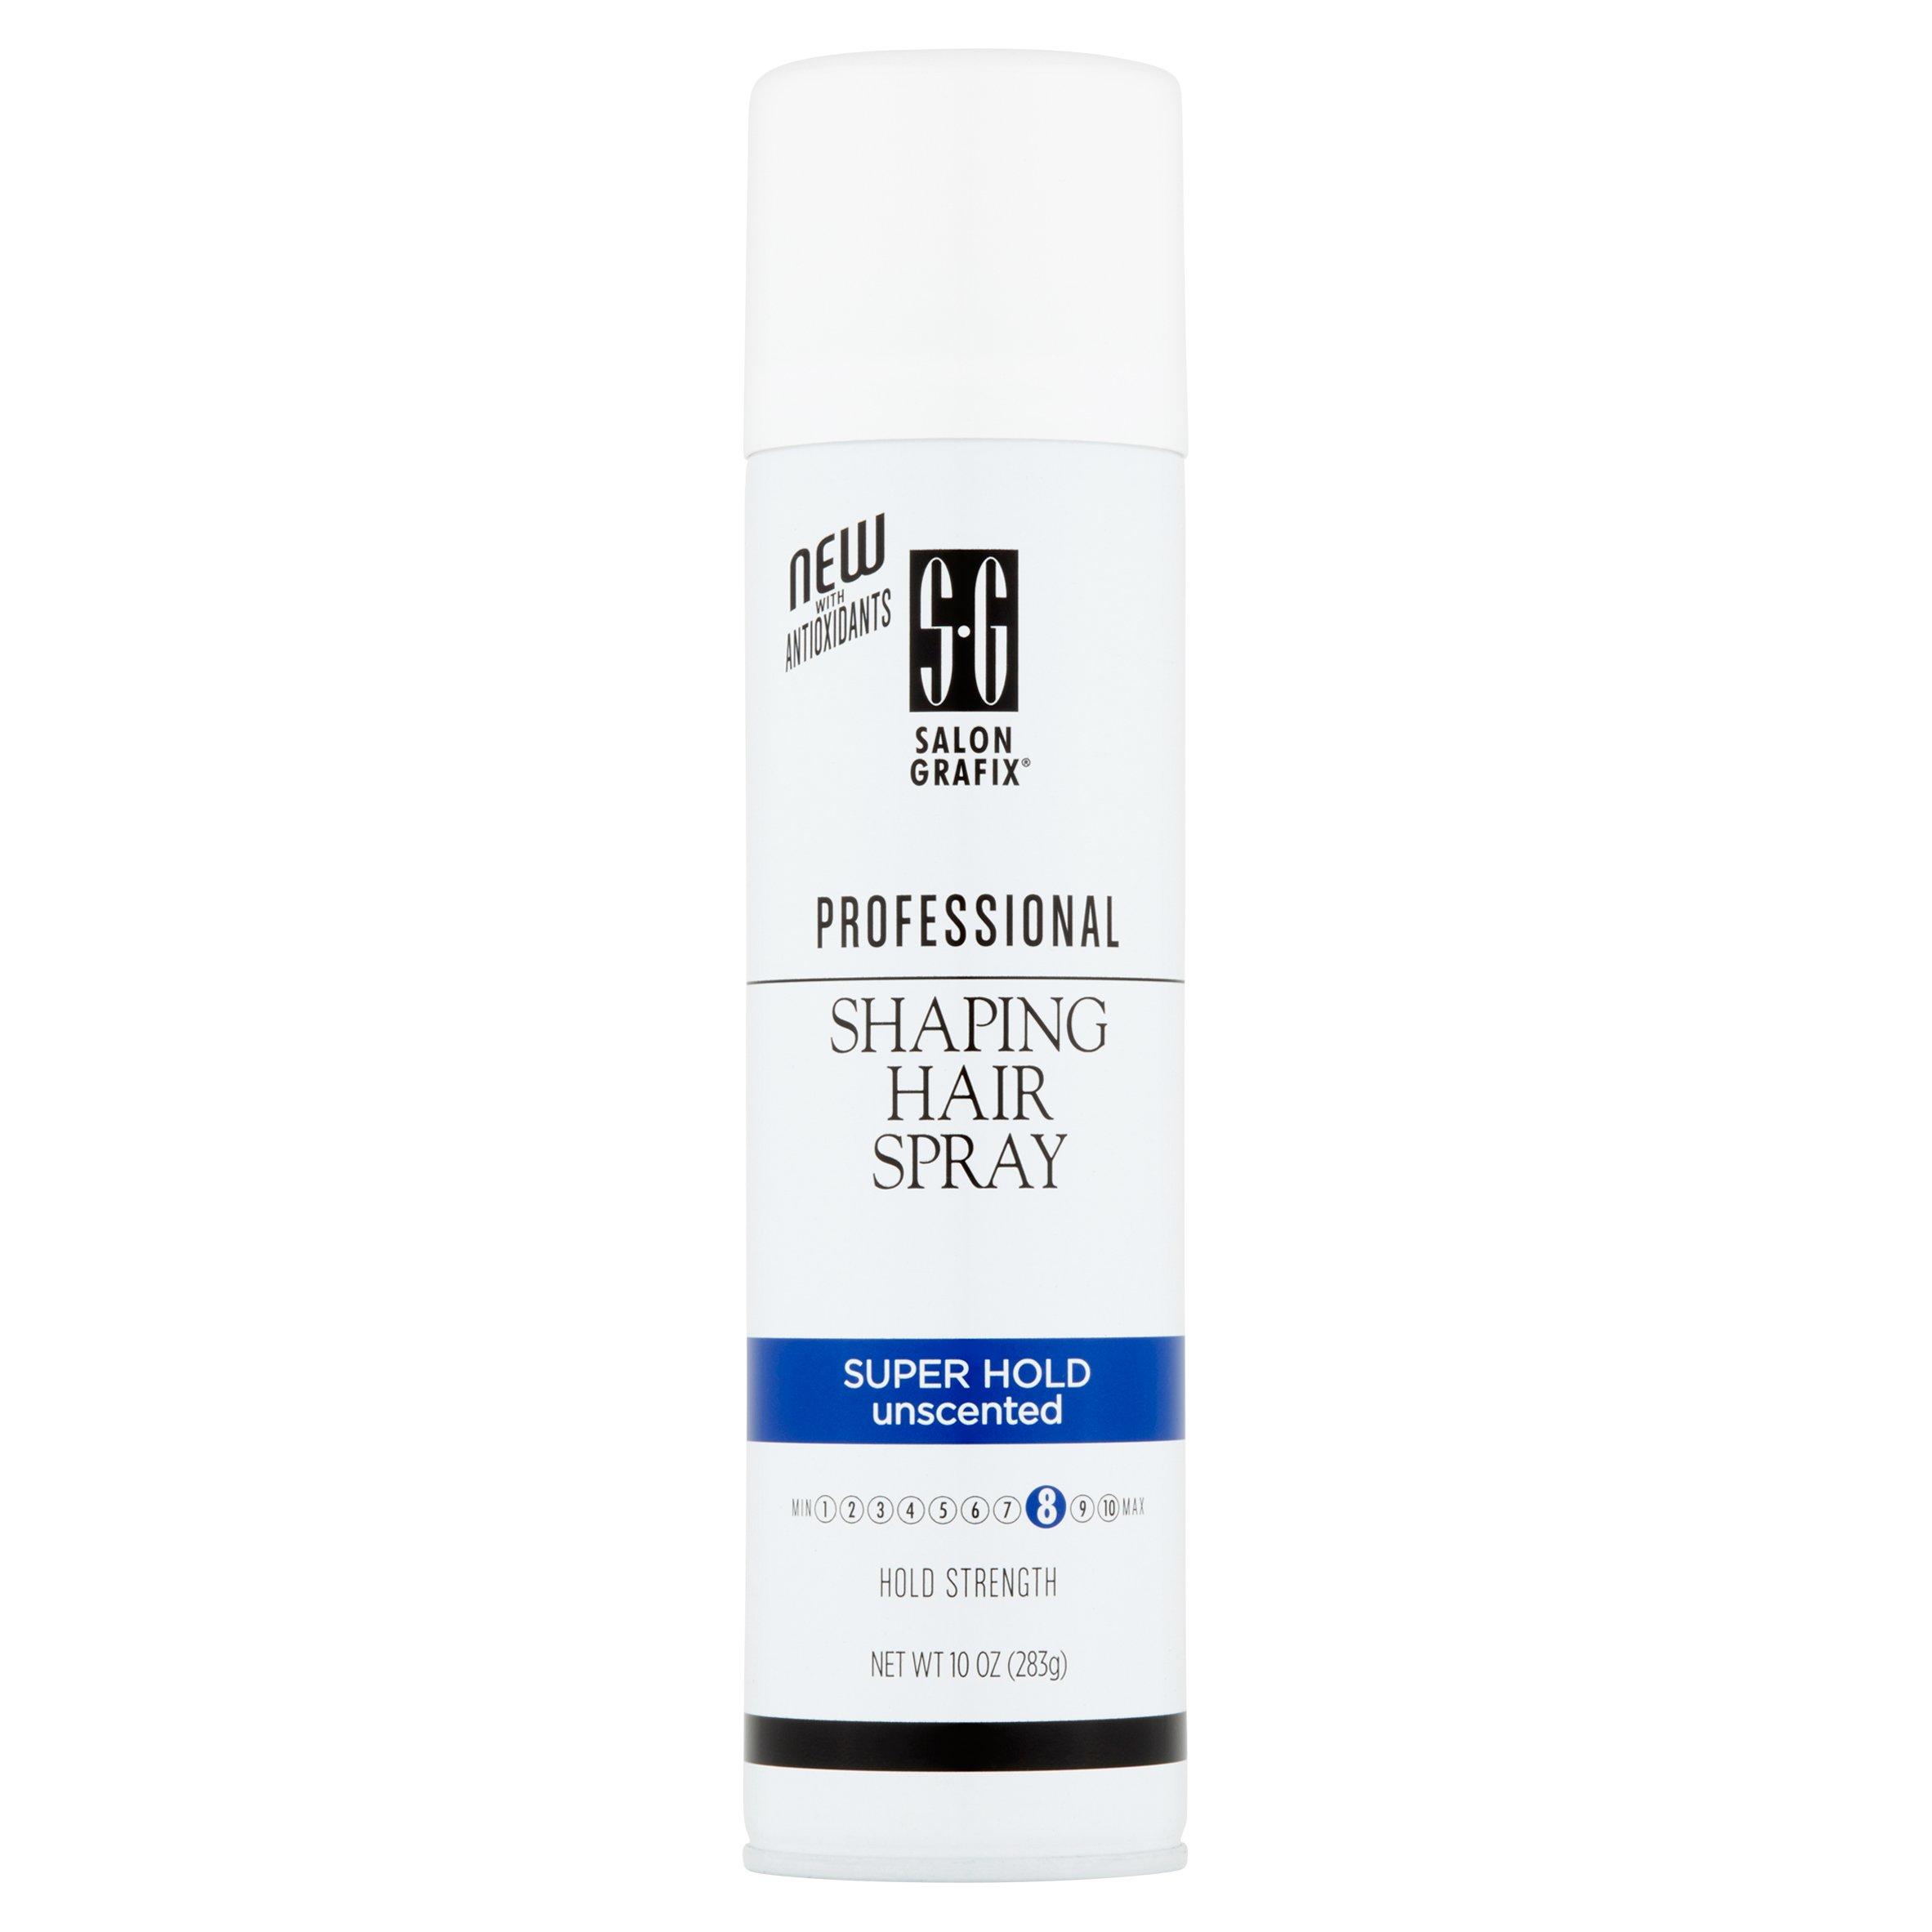 034044125597 Upc Salon Grafix Professional Shaping Hair